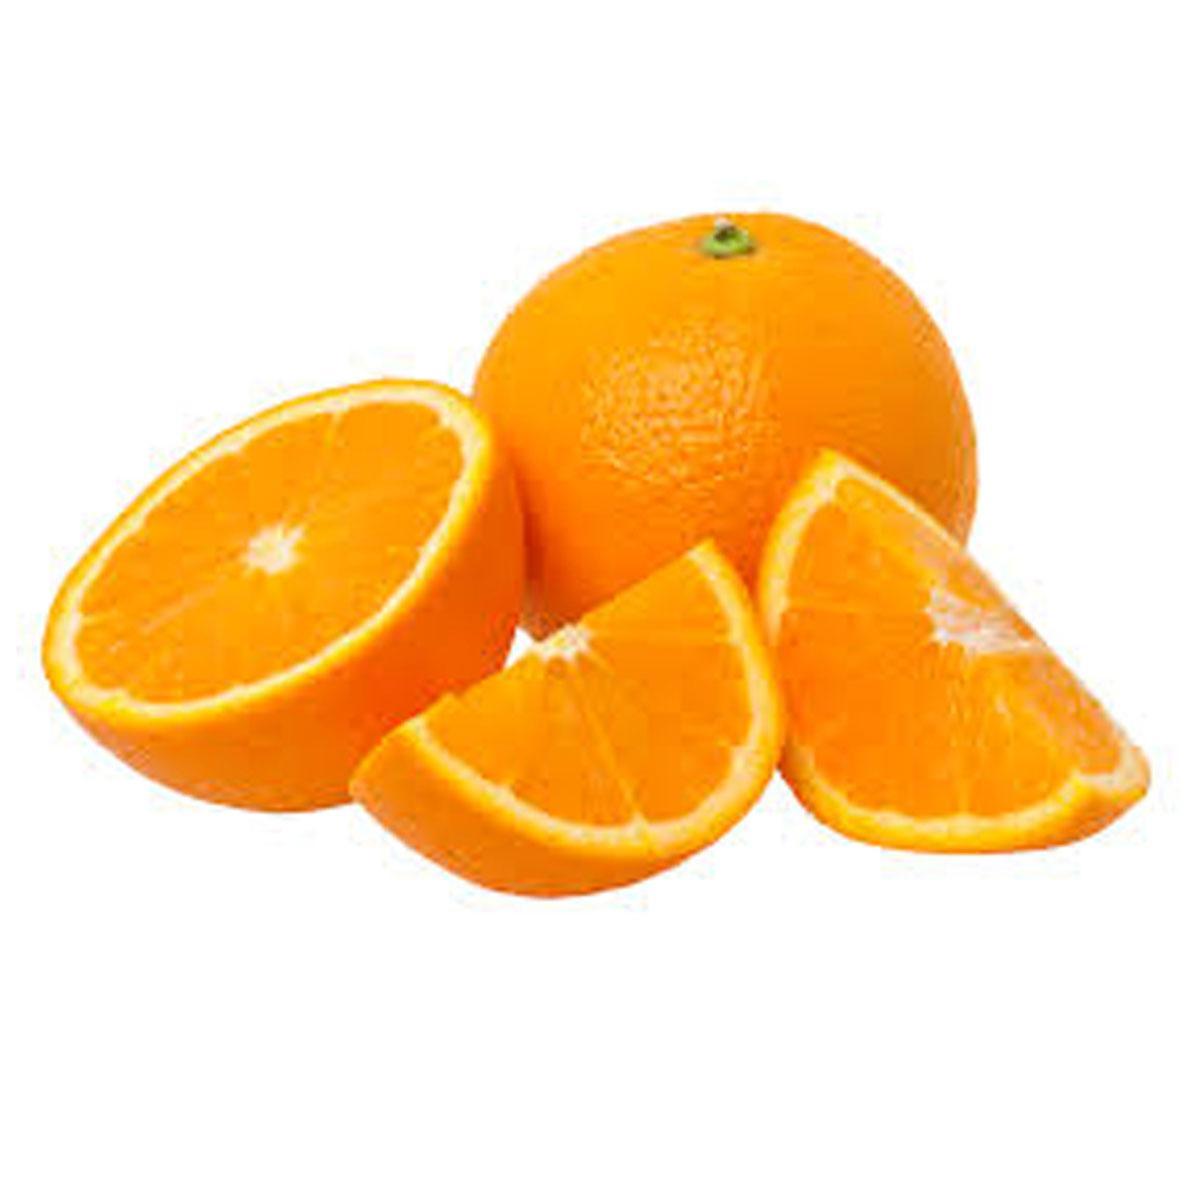 Orange Valencia South Africa